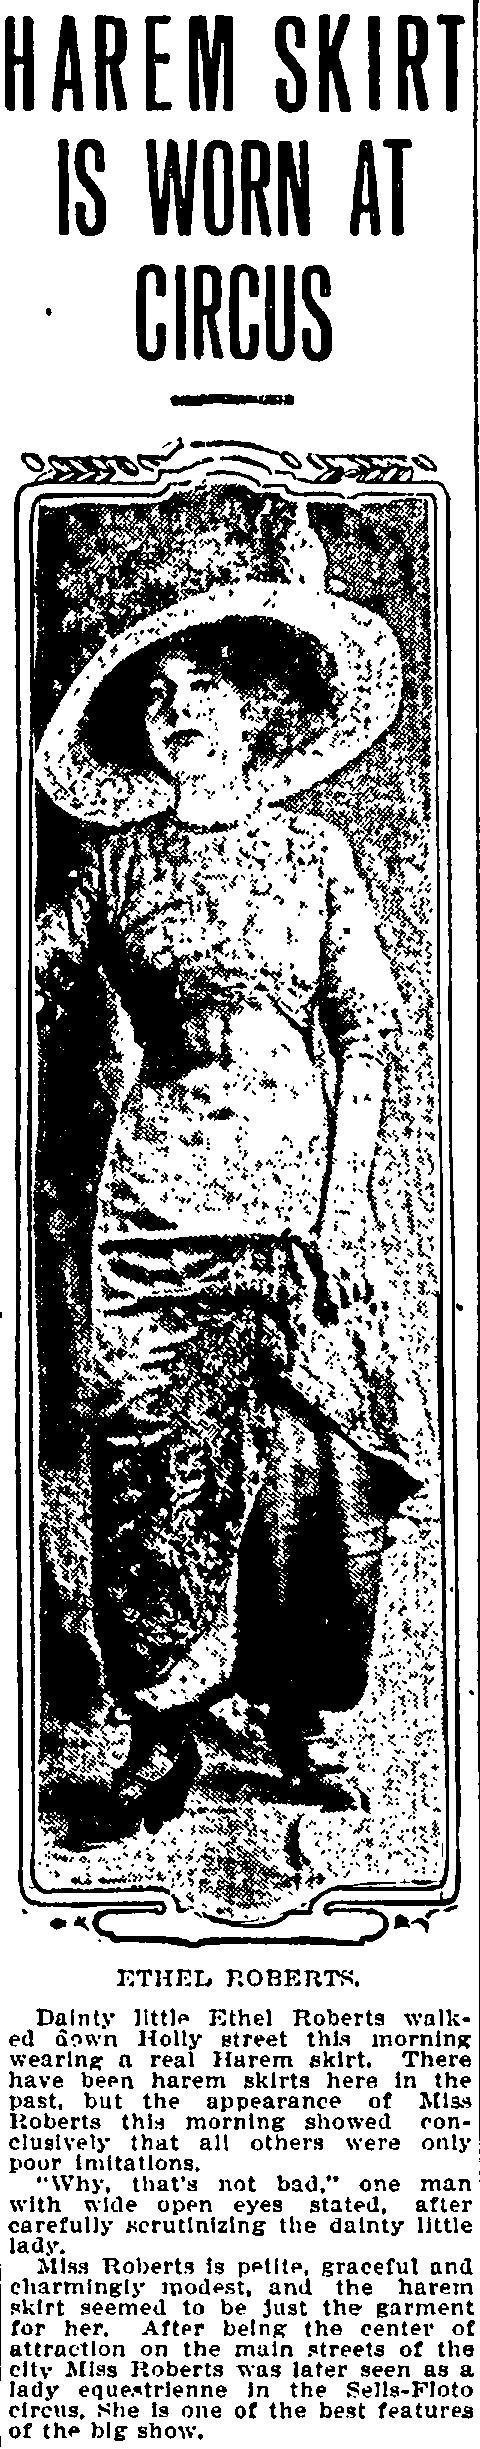 Ethel Roberts 1911 Harem Skirt.jpg